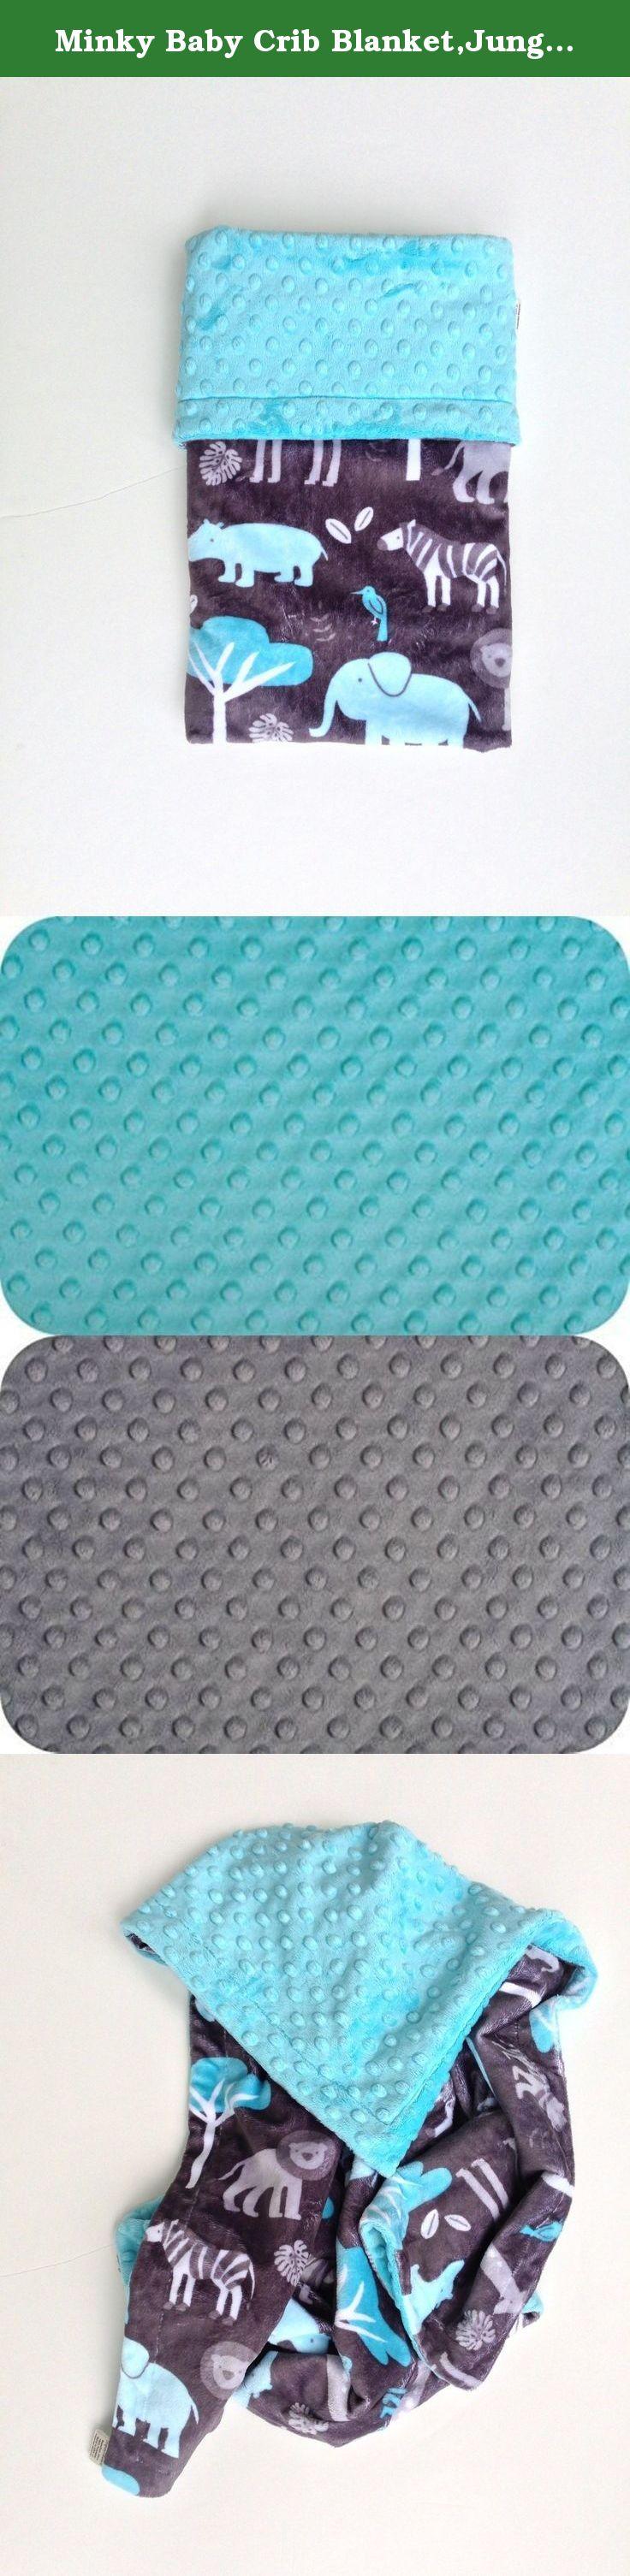 Baby crib zebra print bedding - Minky Baby Crib Blanket Jungle Or Zoo Theme Animal Print Bedding Crib Size 36 X